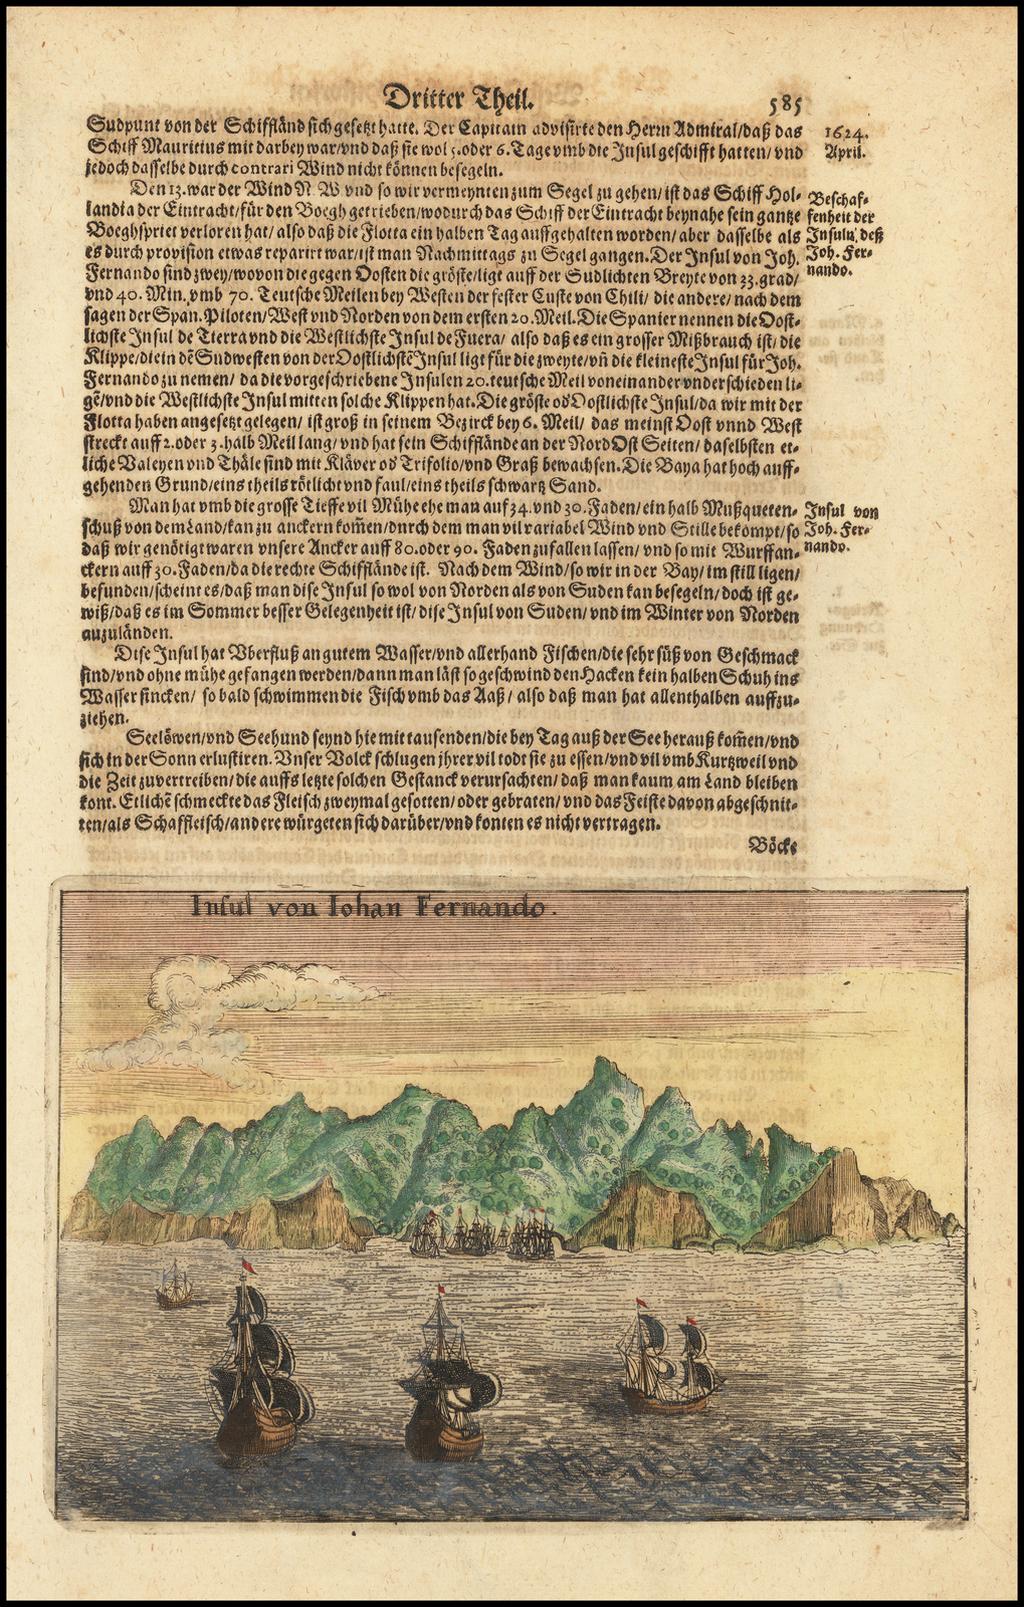 Insul von Iohan Fernando By Theodor De Bry / Matthaeus Merian